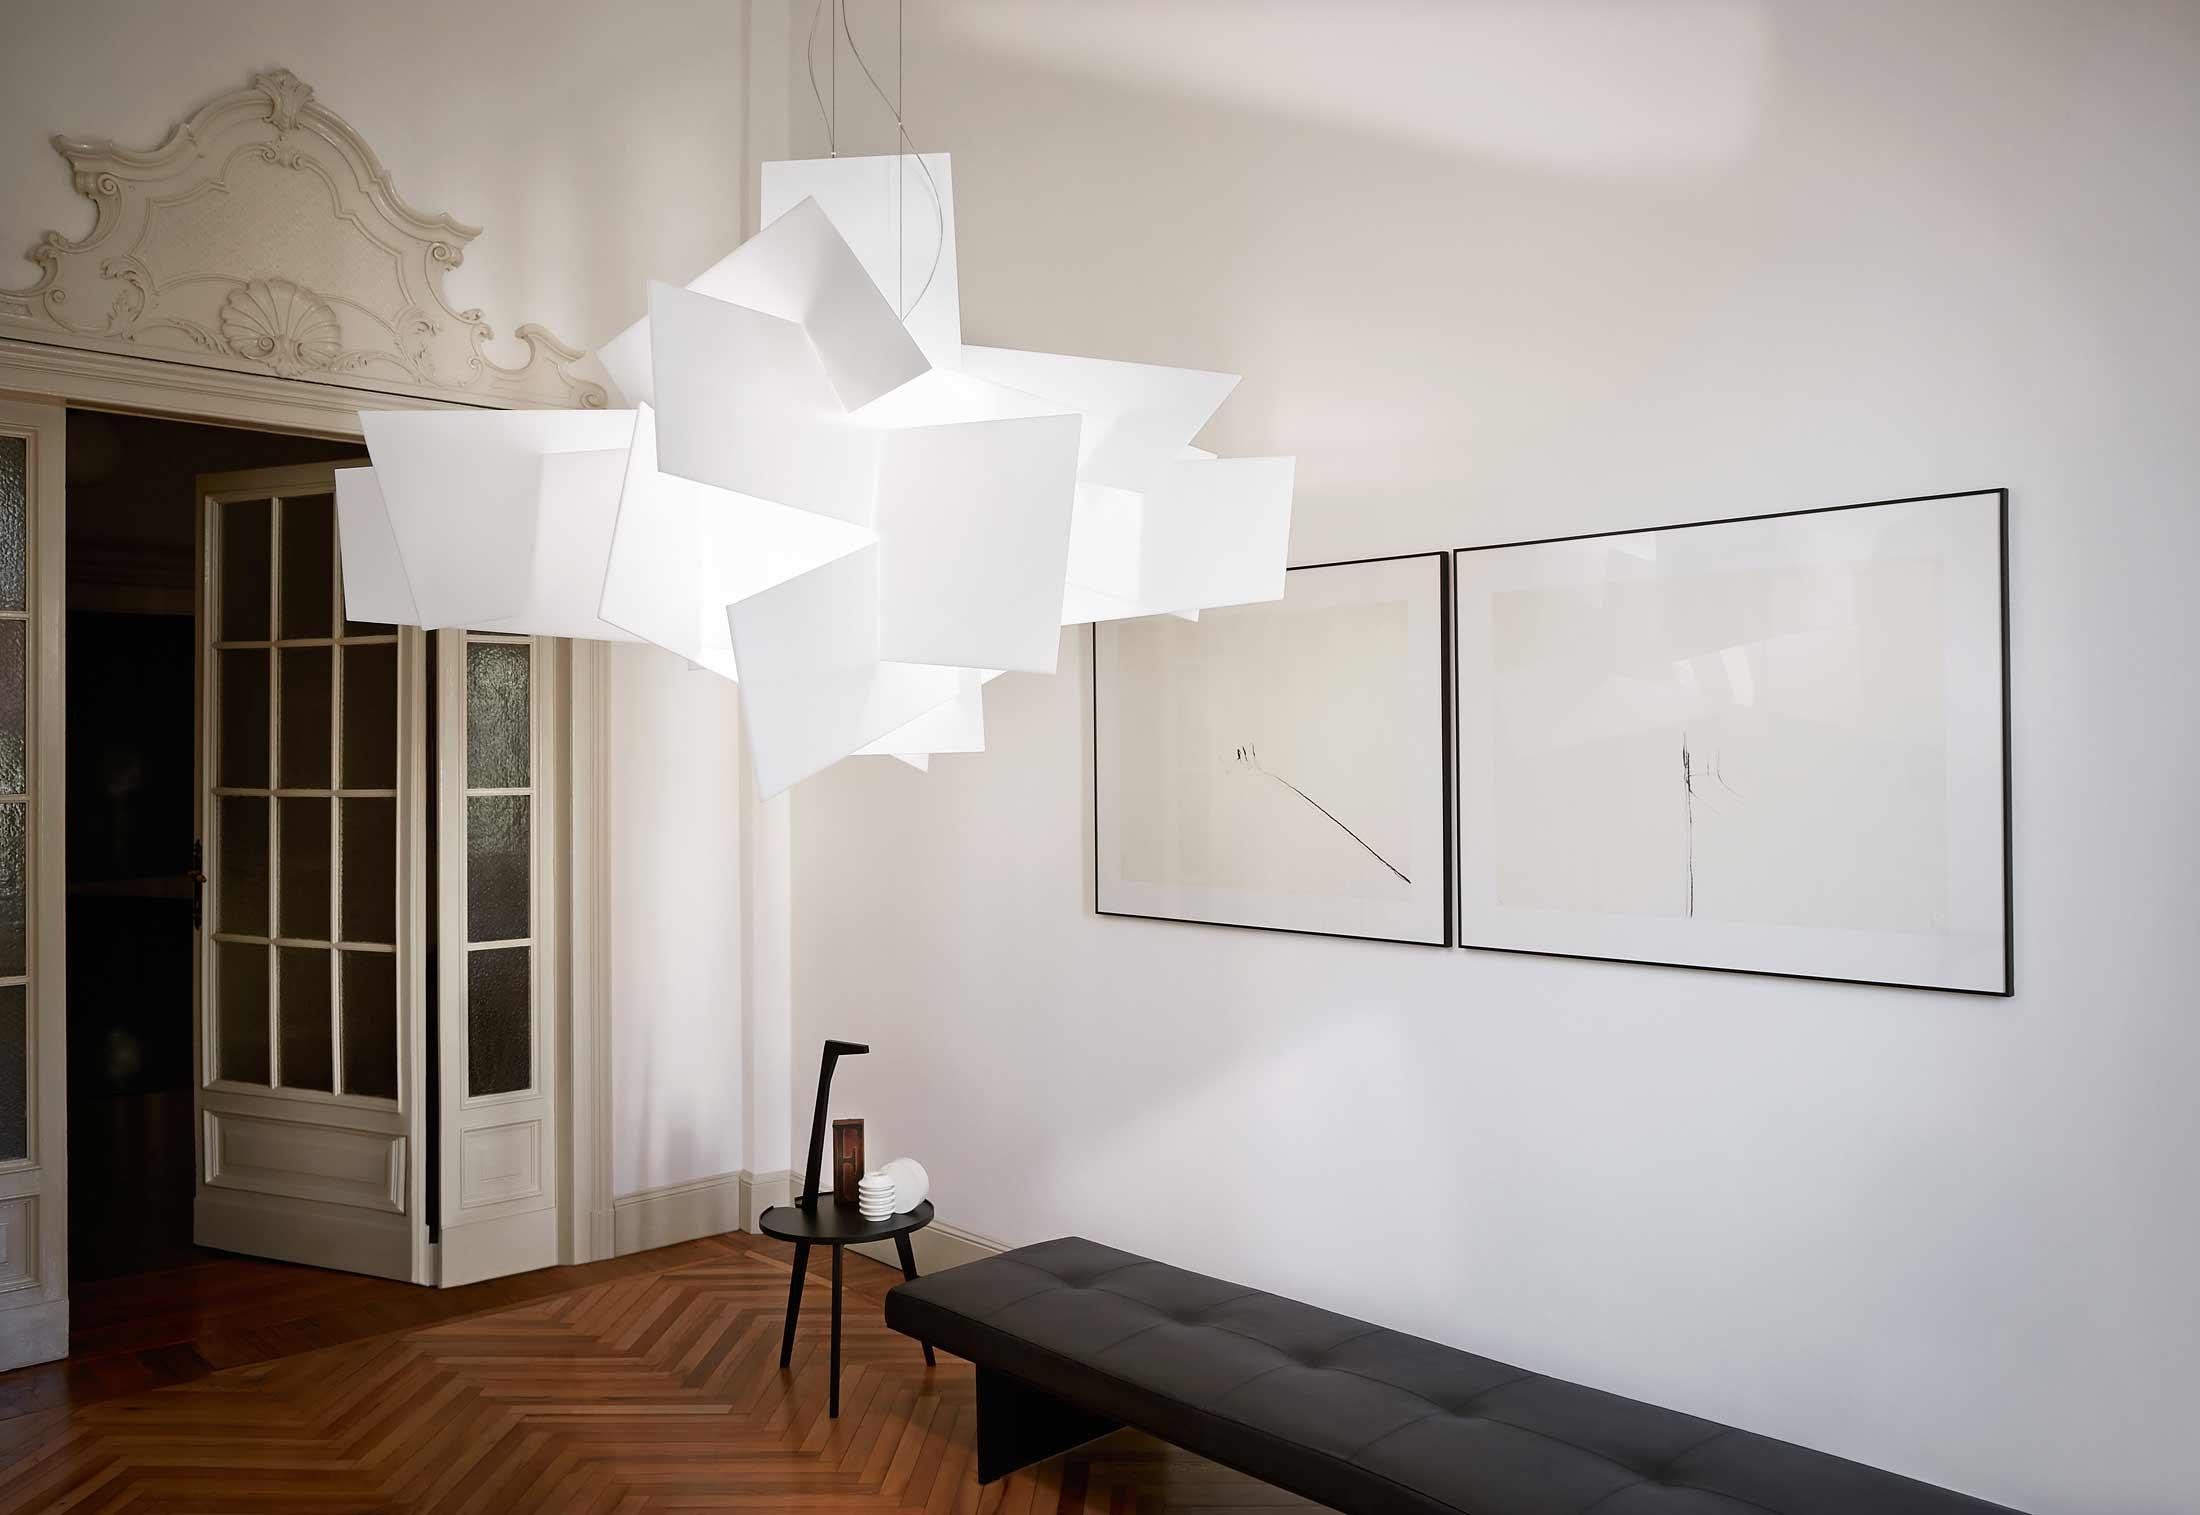 Big Bang Suspension Lamp by Enrico Franzolini & Vicente Garcia Jiménez for Foscarini